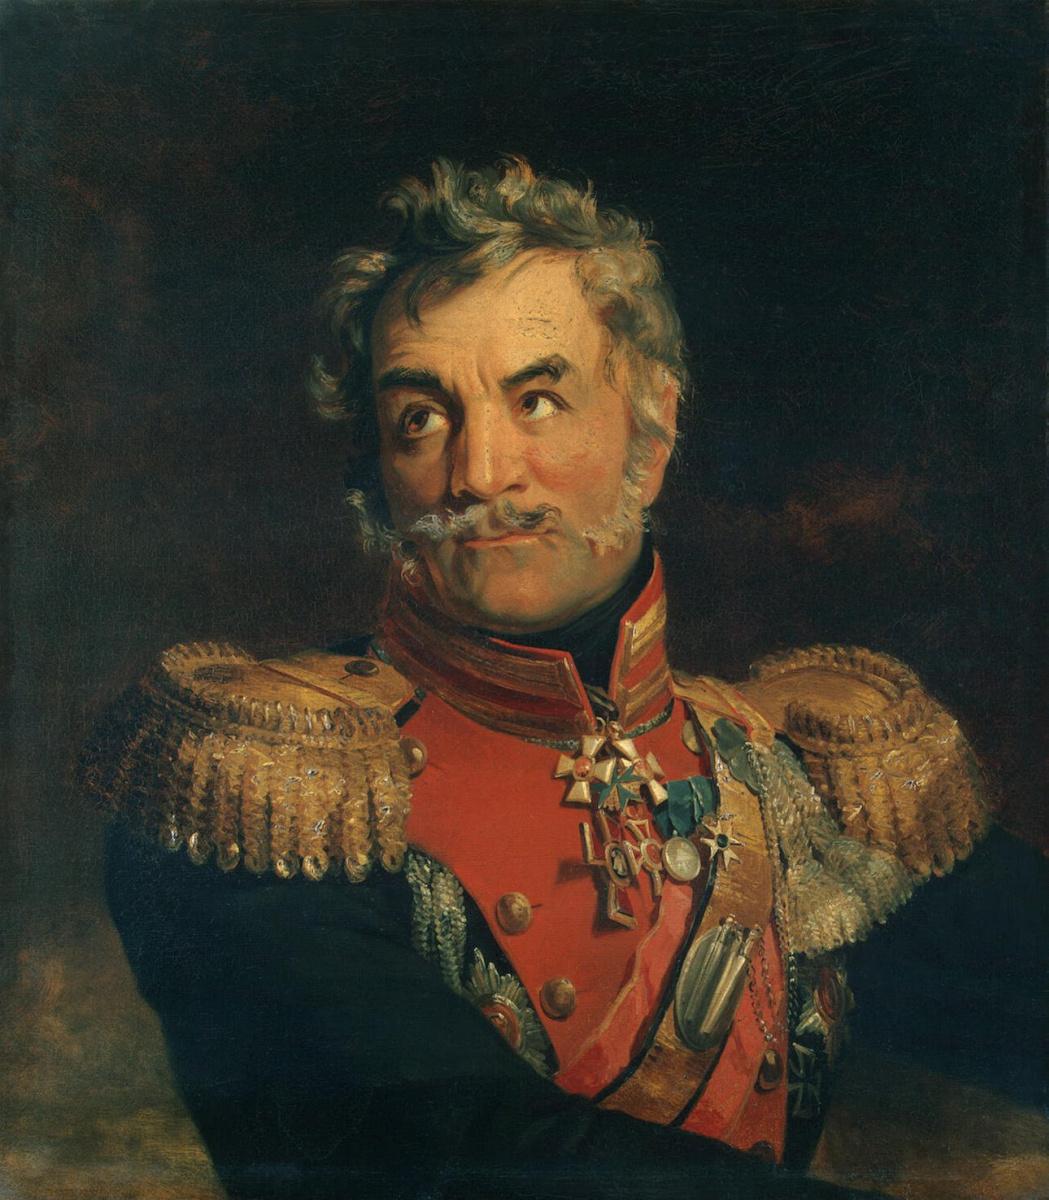 Джордж Доу. Портрет Антона Степановича Чаликова